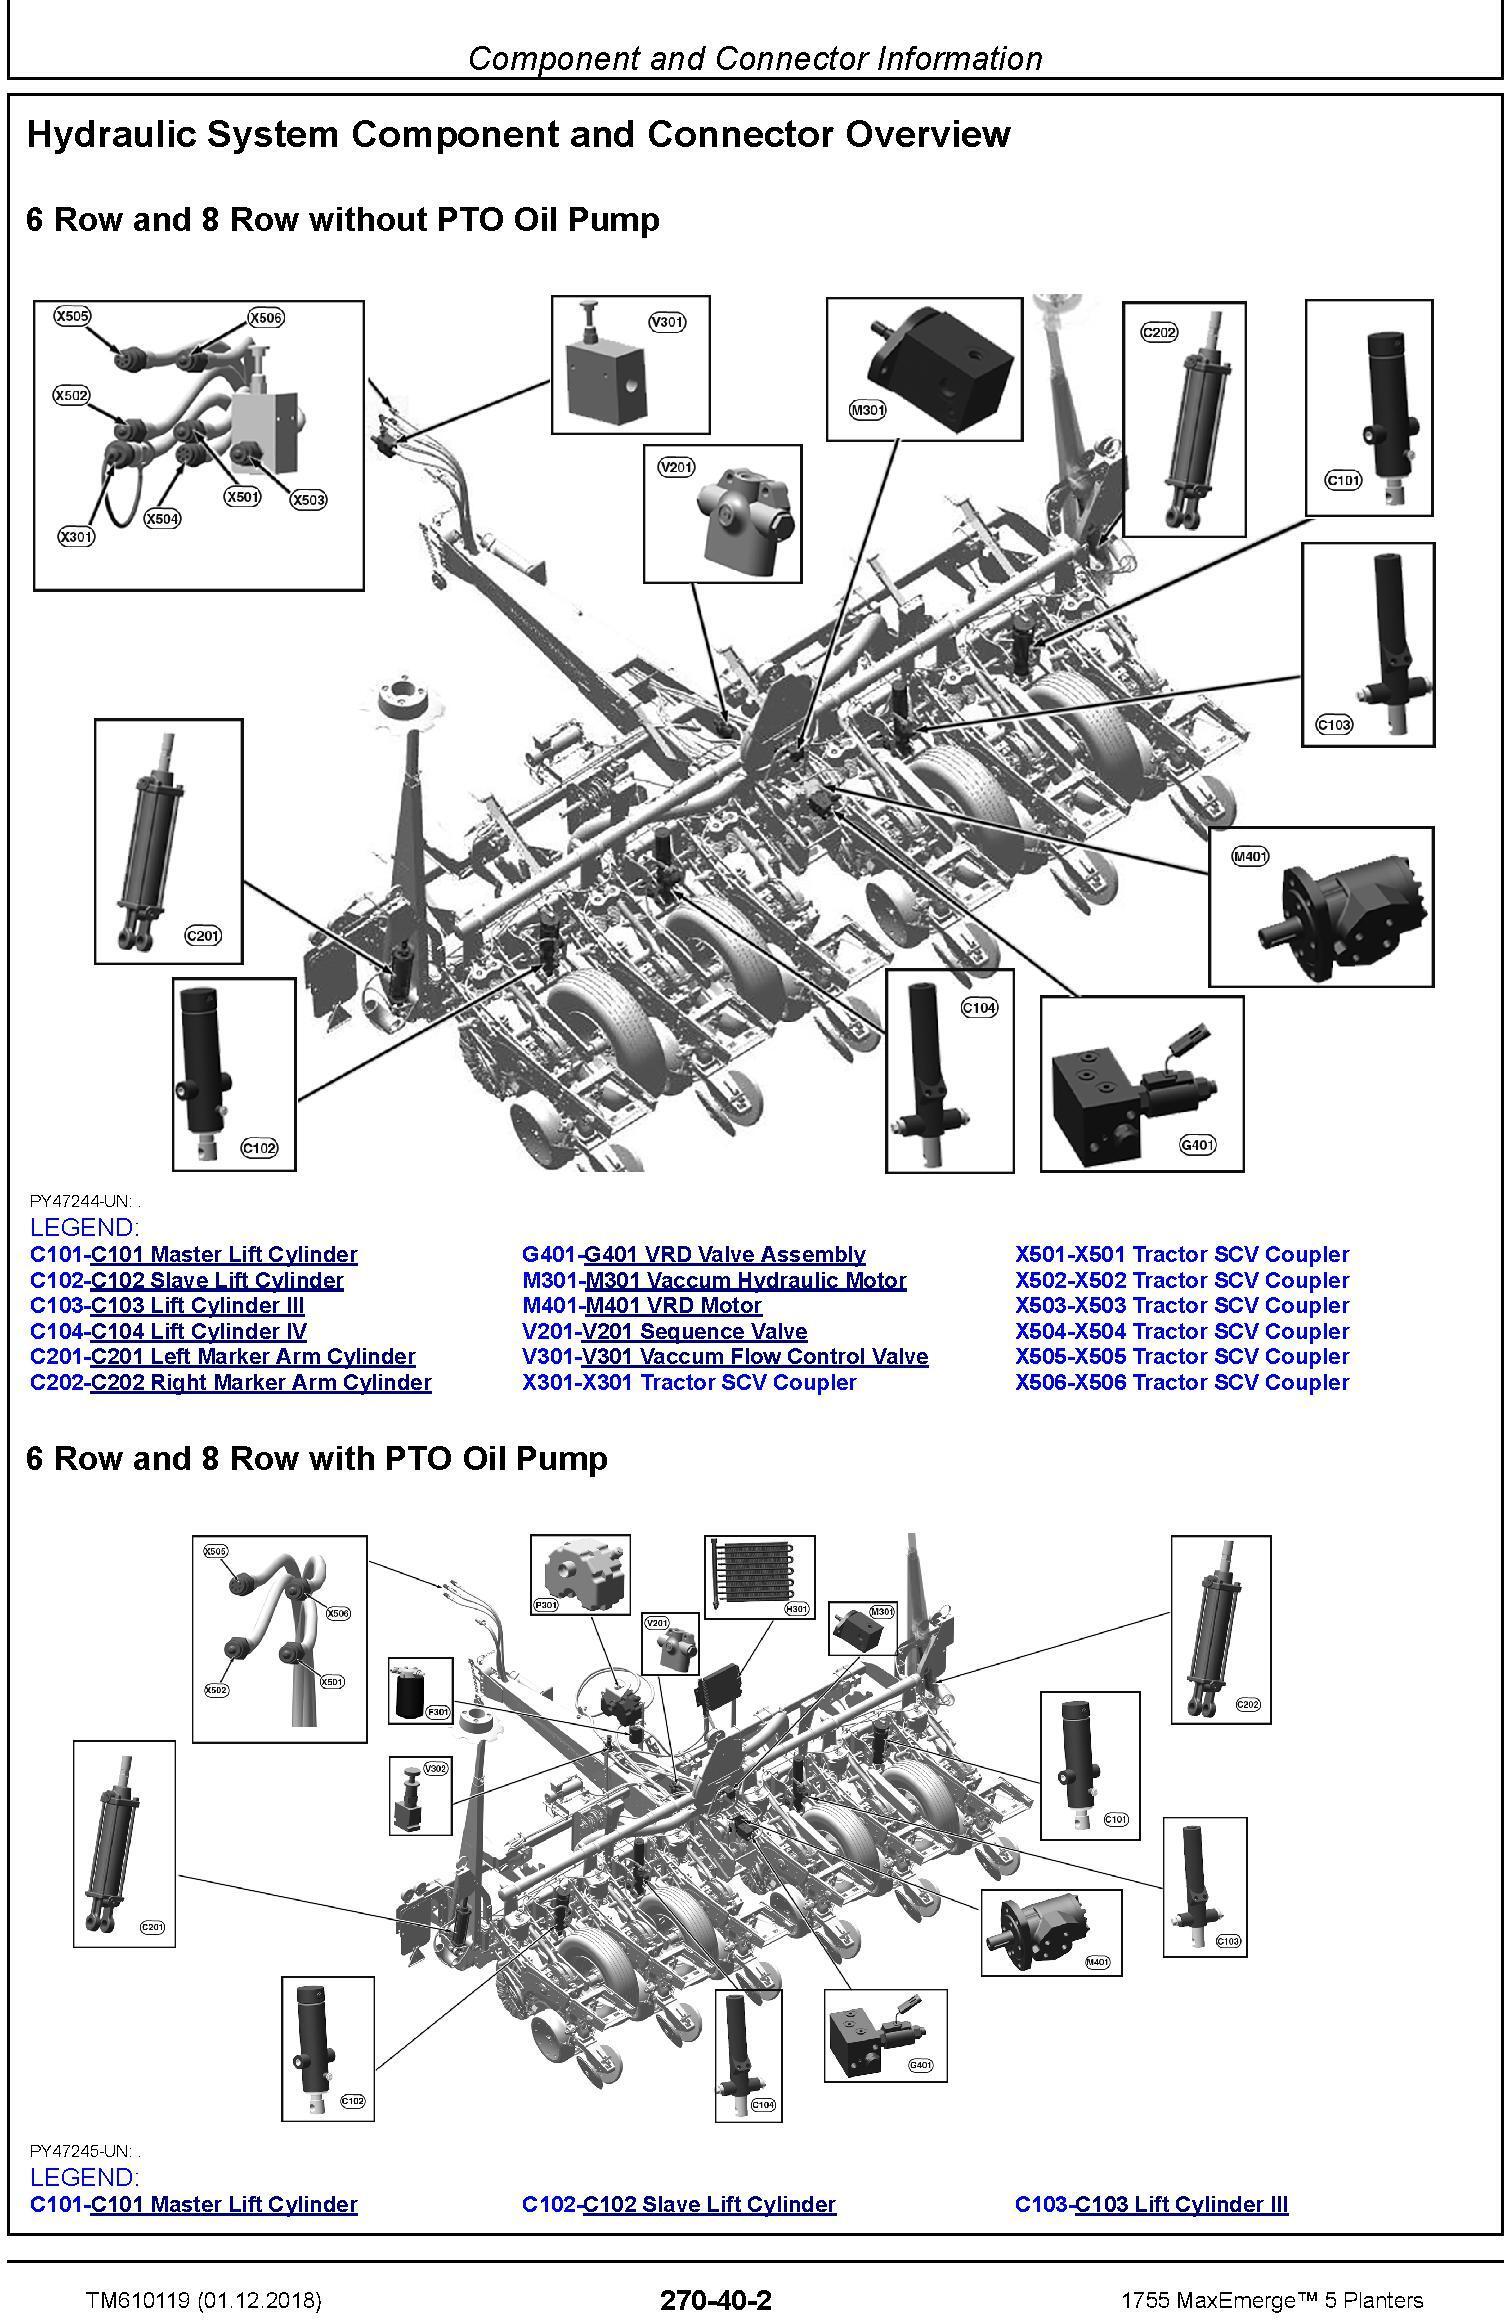 JD John Deere 1755 MaxEmerge 5 Planters Diagnostic Technical Service Manual (TM610119) - 3